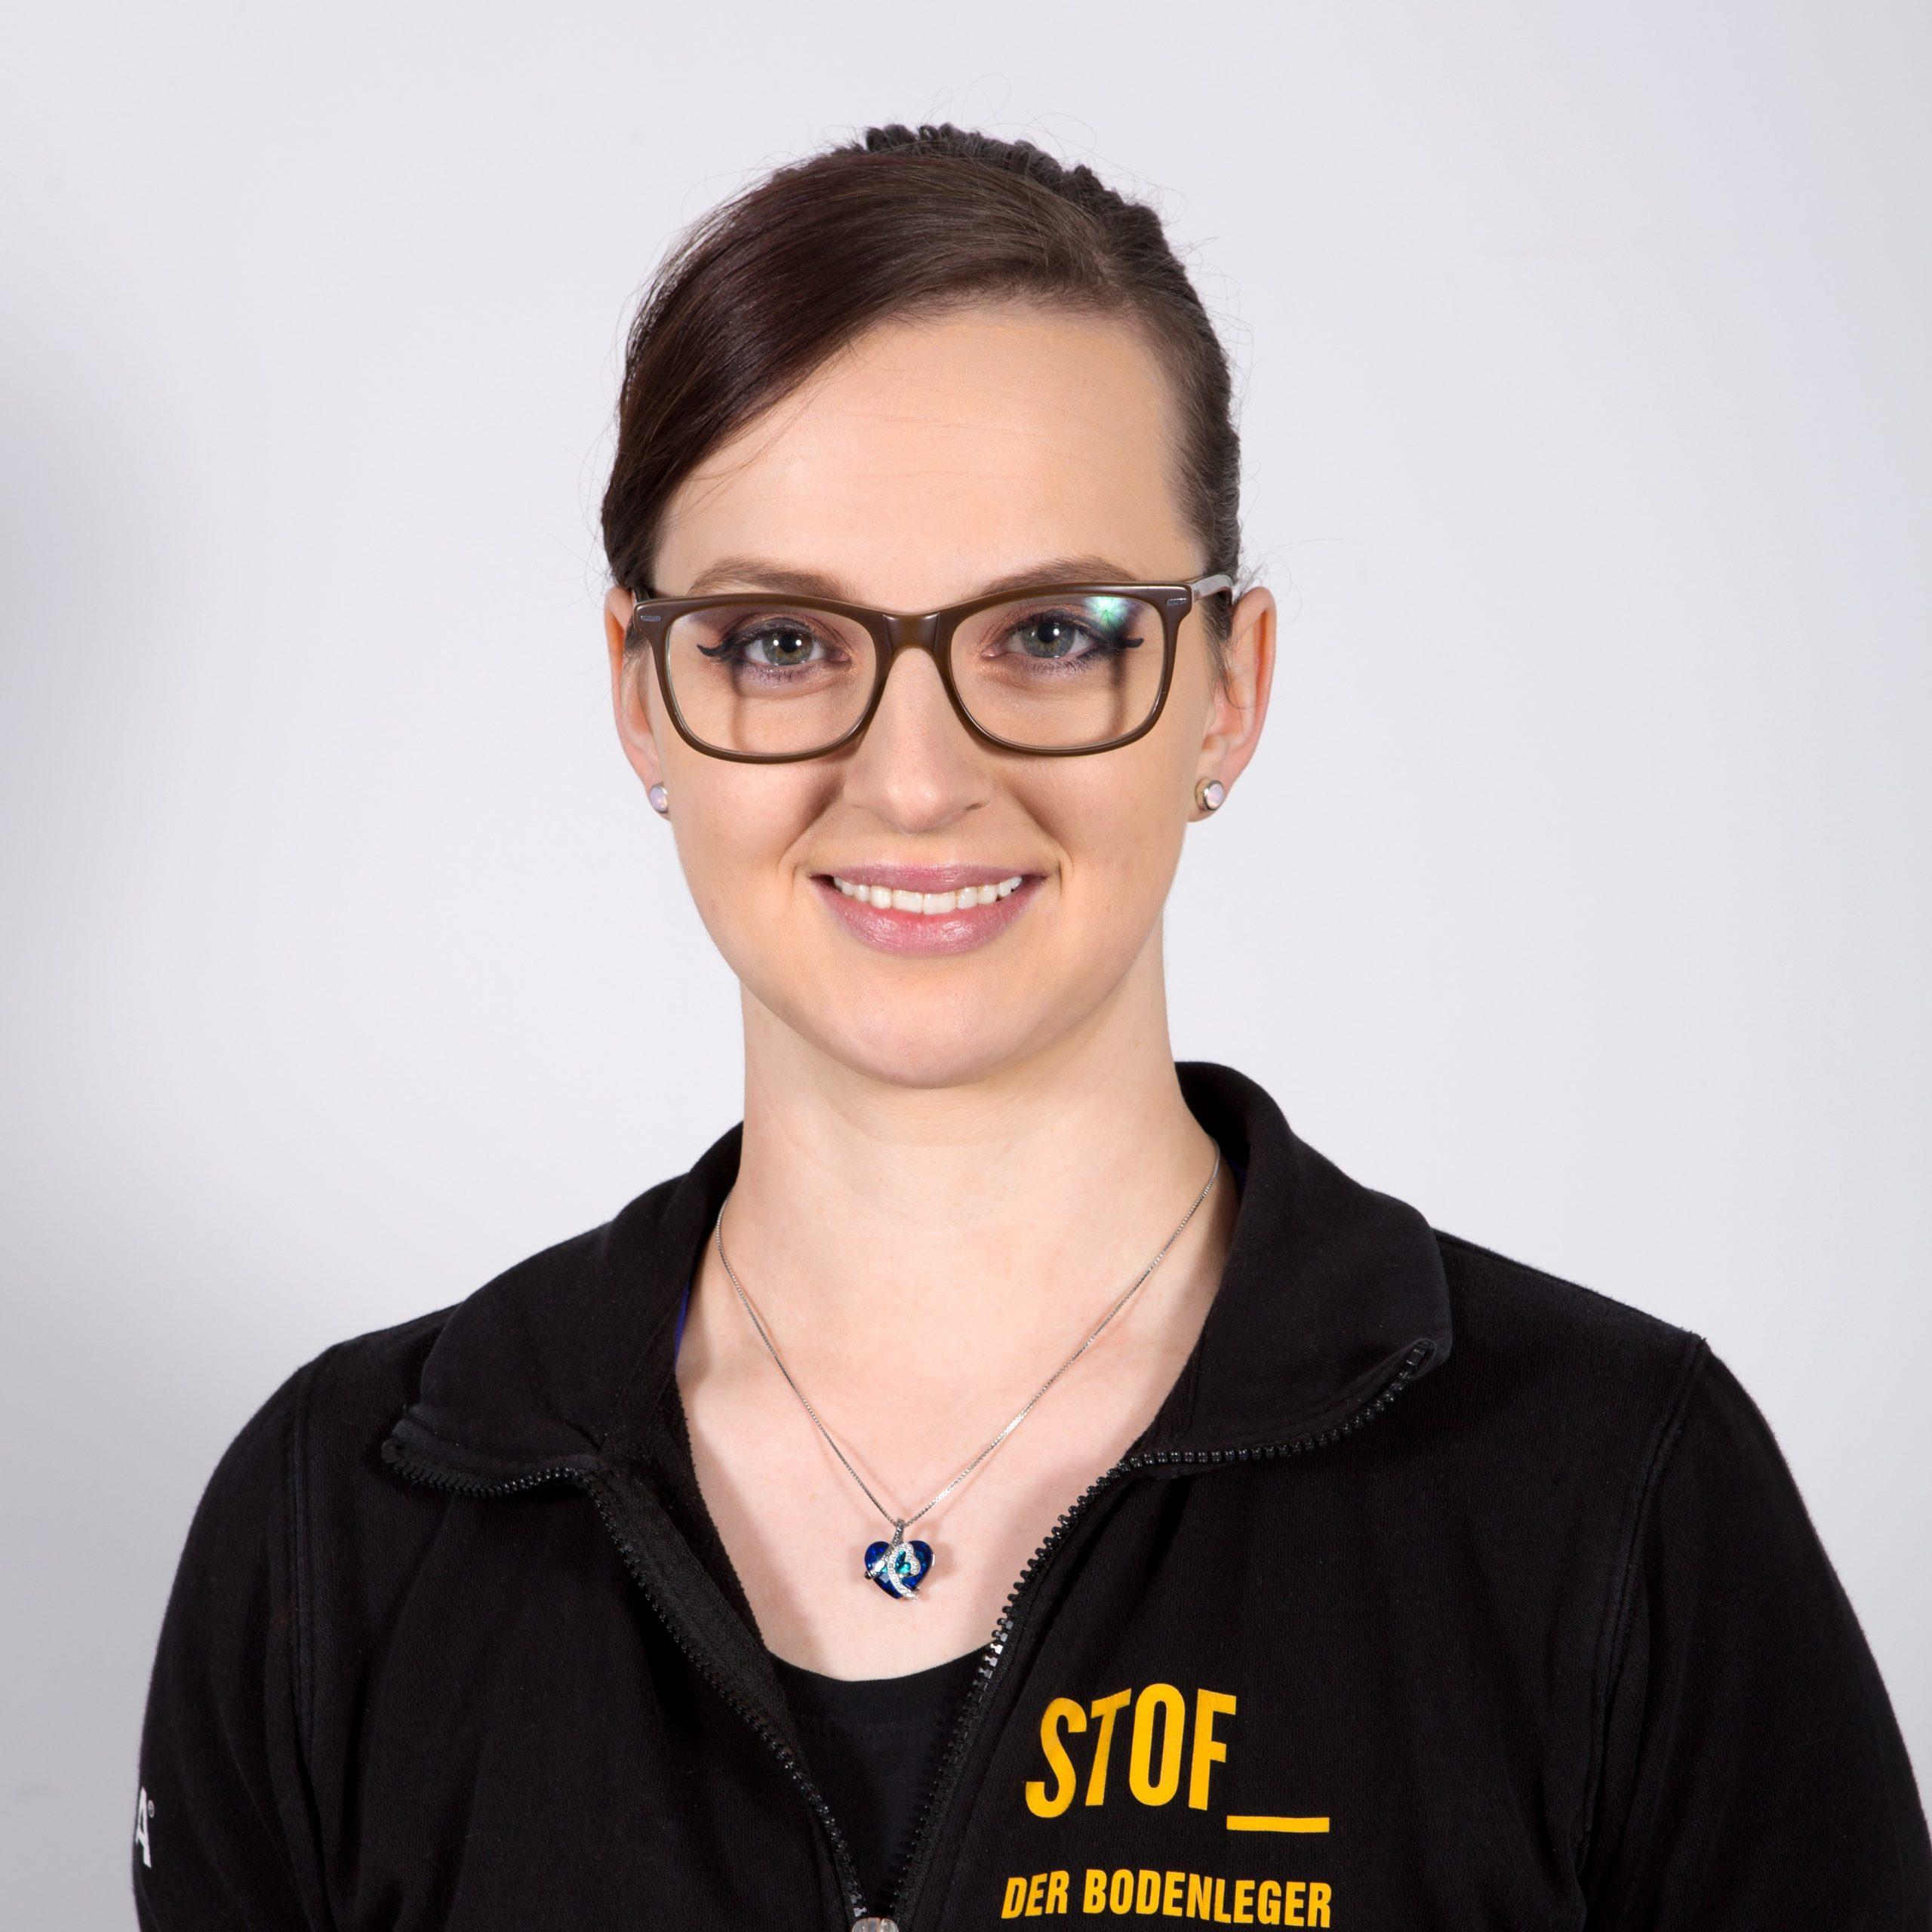 Nathalie Stof